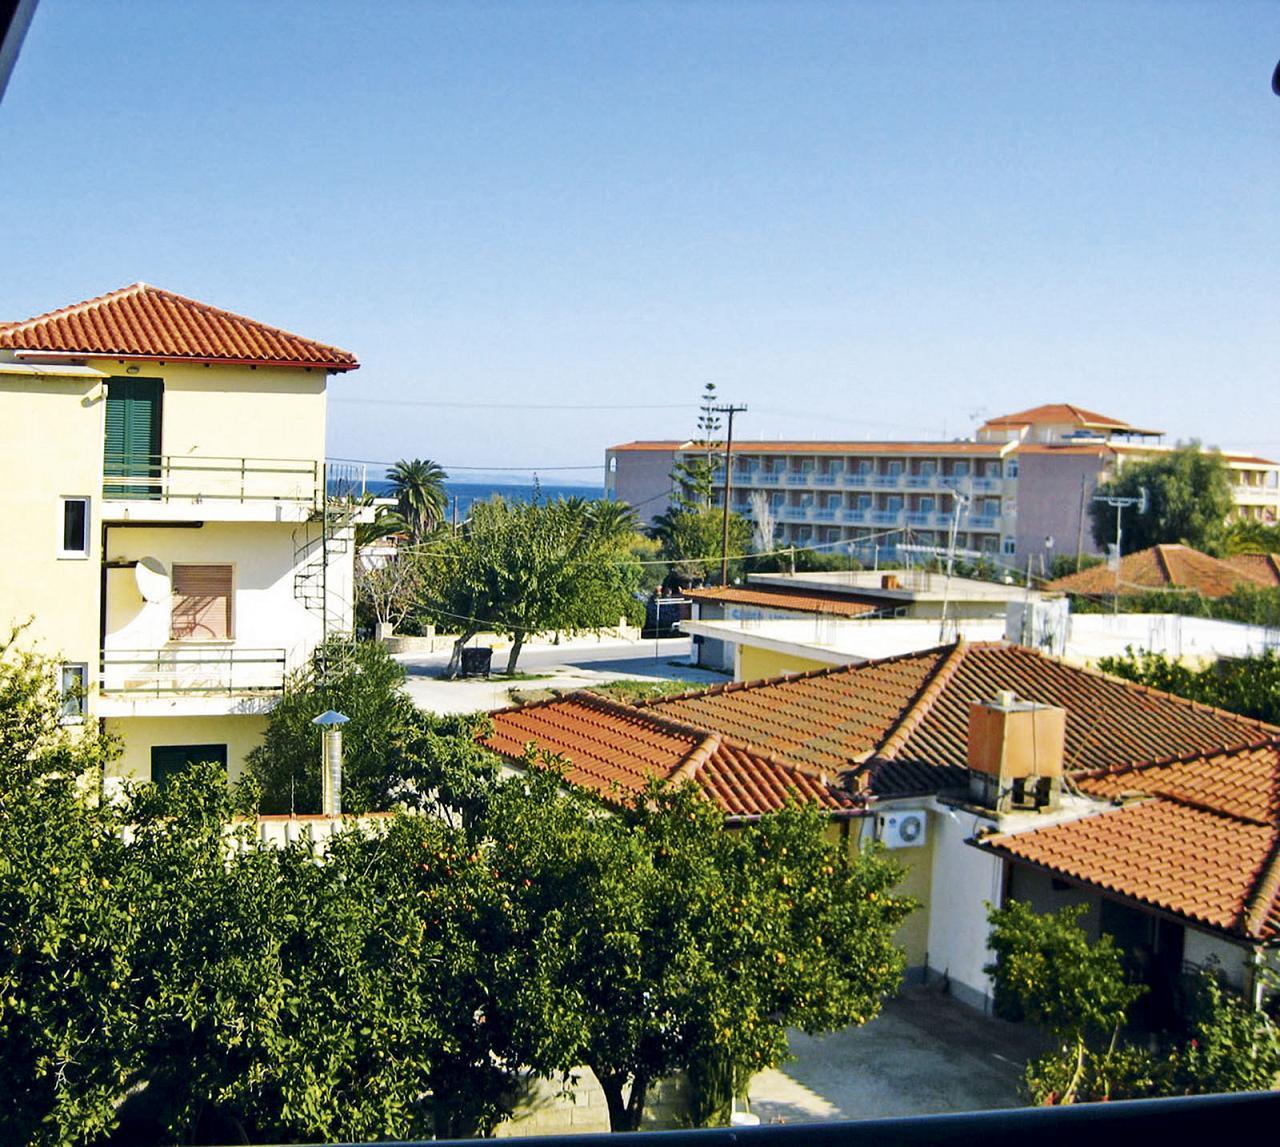 http://www.budavartours.hu/binaries//content/gallery/budavar/locations/accomodations/G%C3%B6r%C3%B6gorsz%C3%A1g/Argassi/Valasis+Apartman/valasis_apartman_argassi_epulet.jpg